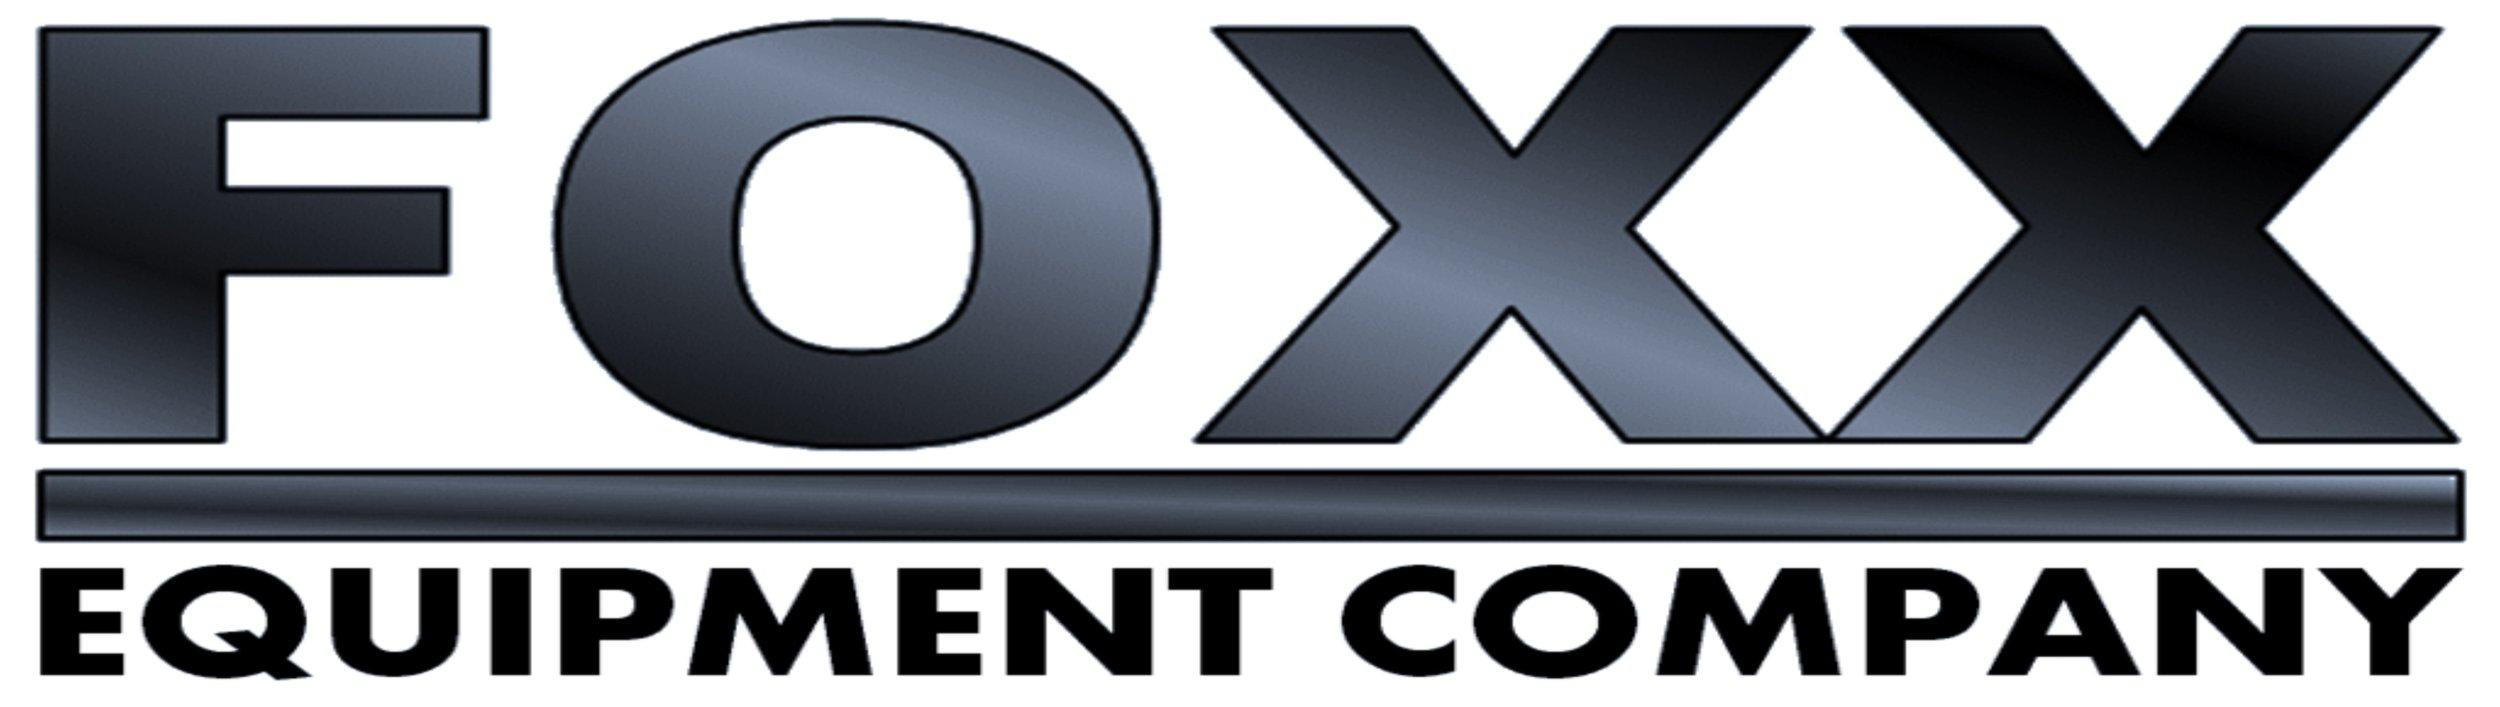 FOXX_LOGO.jpg